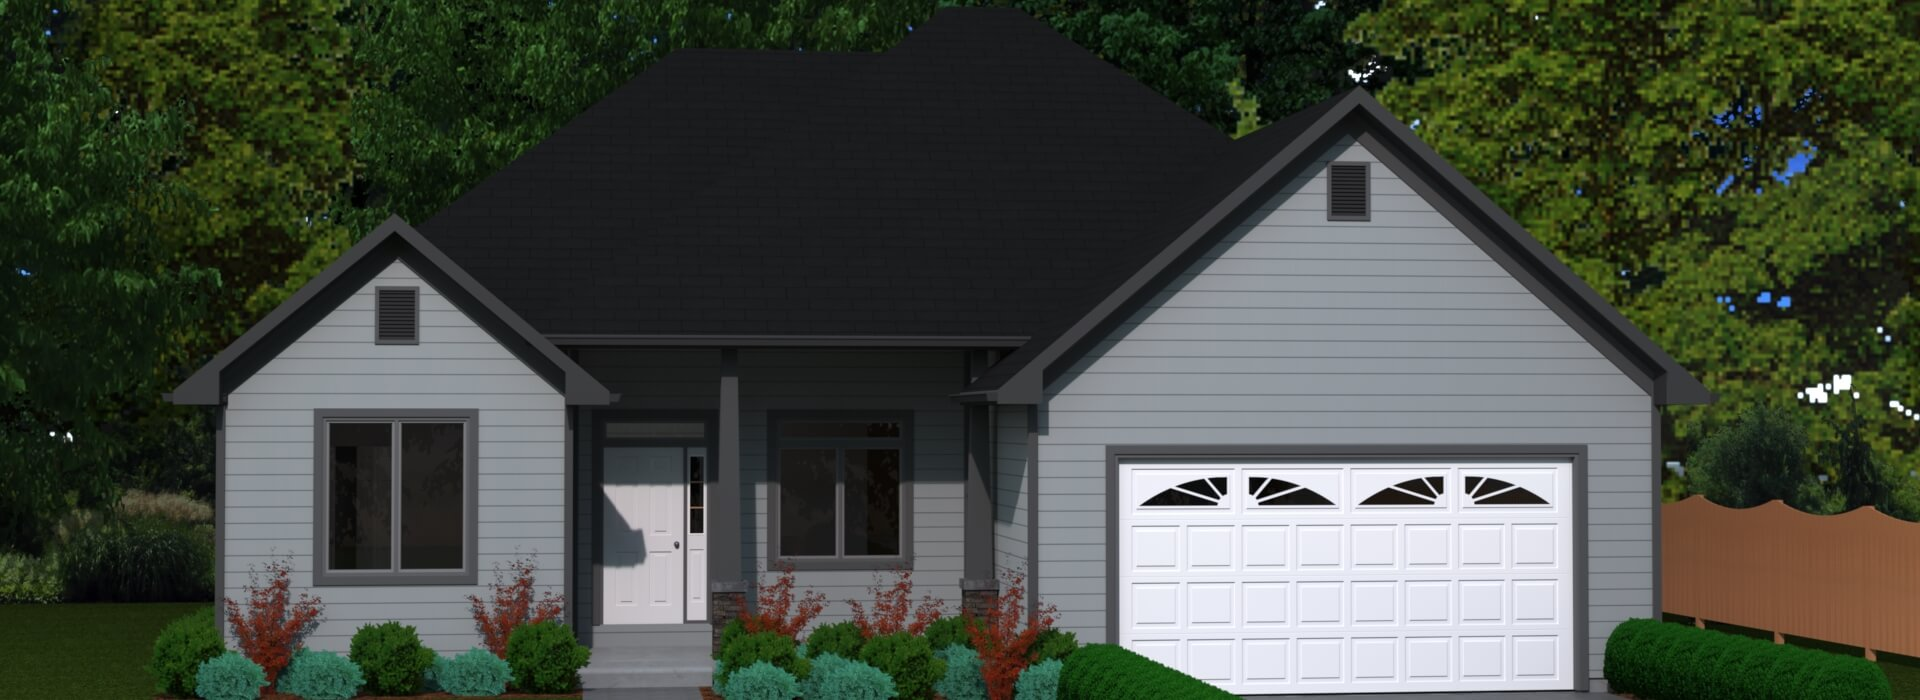 1480 house elevation